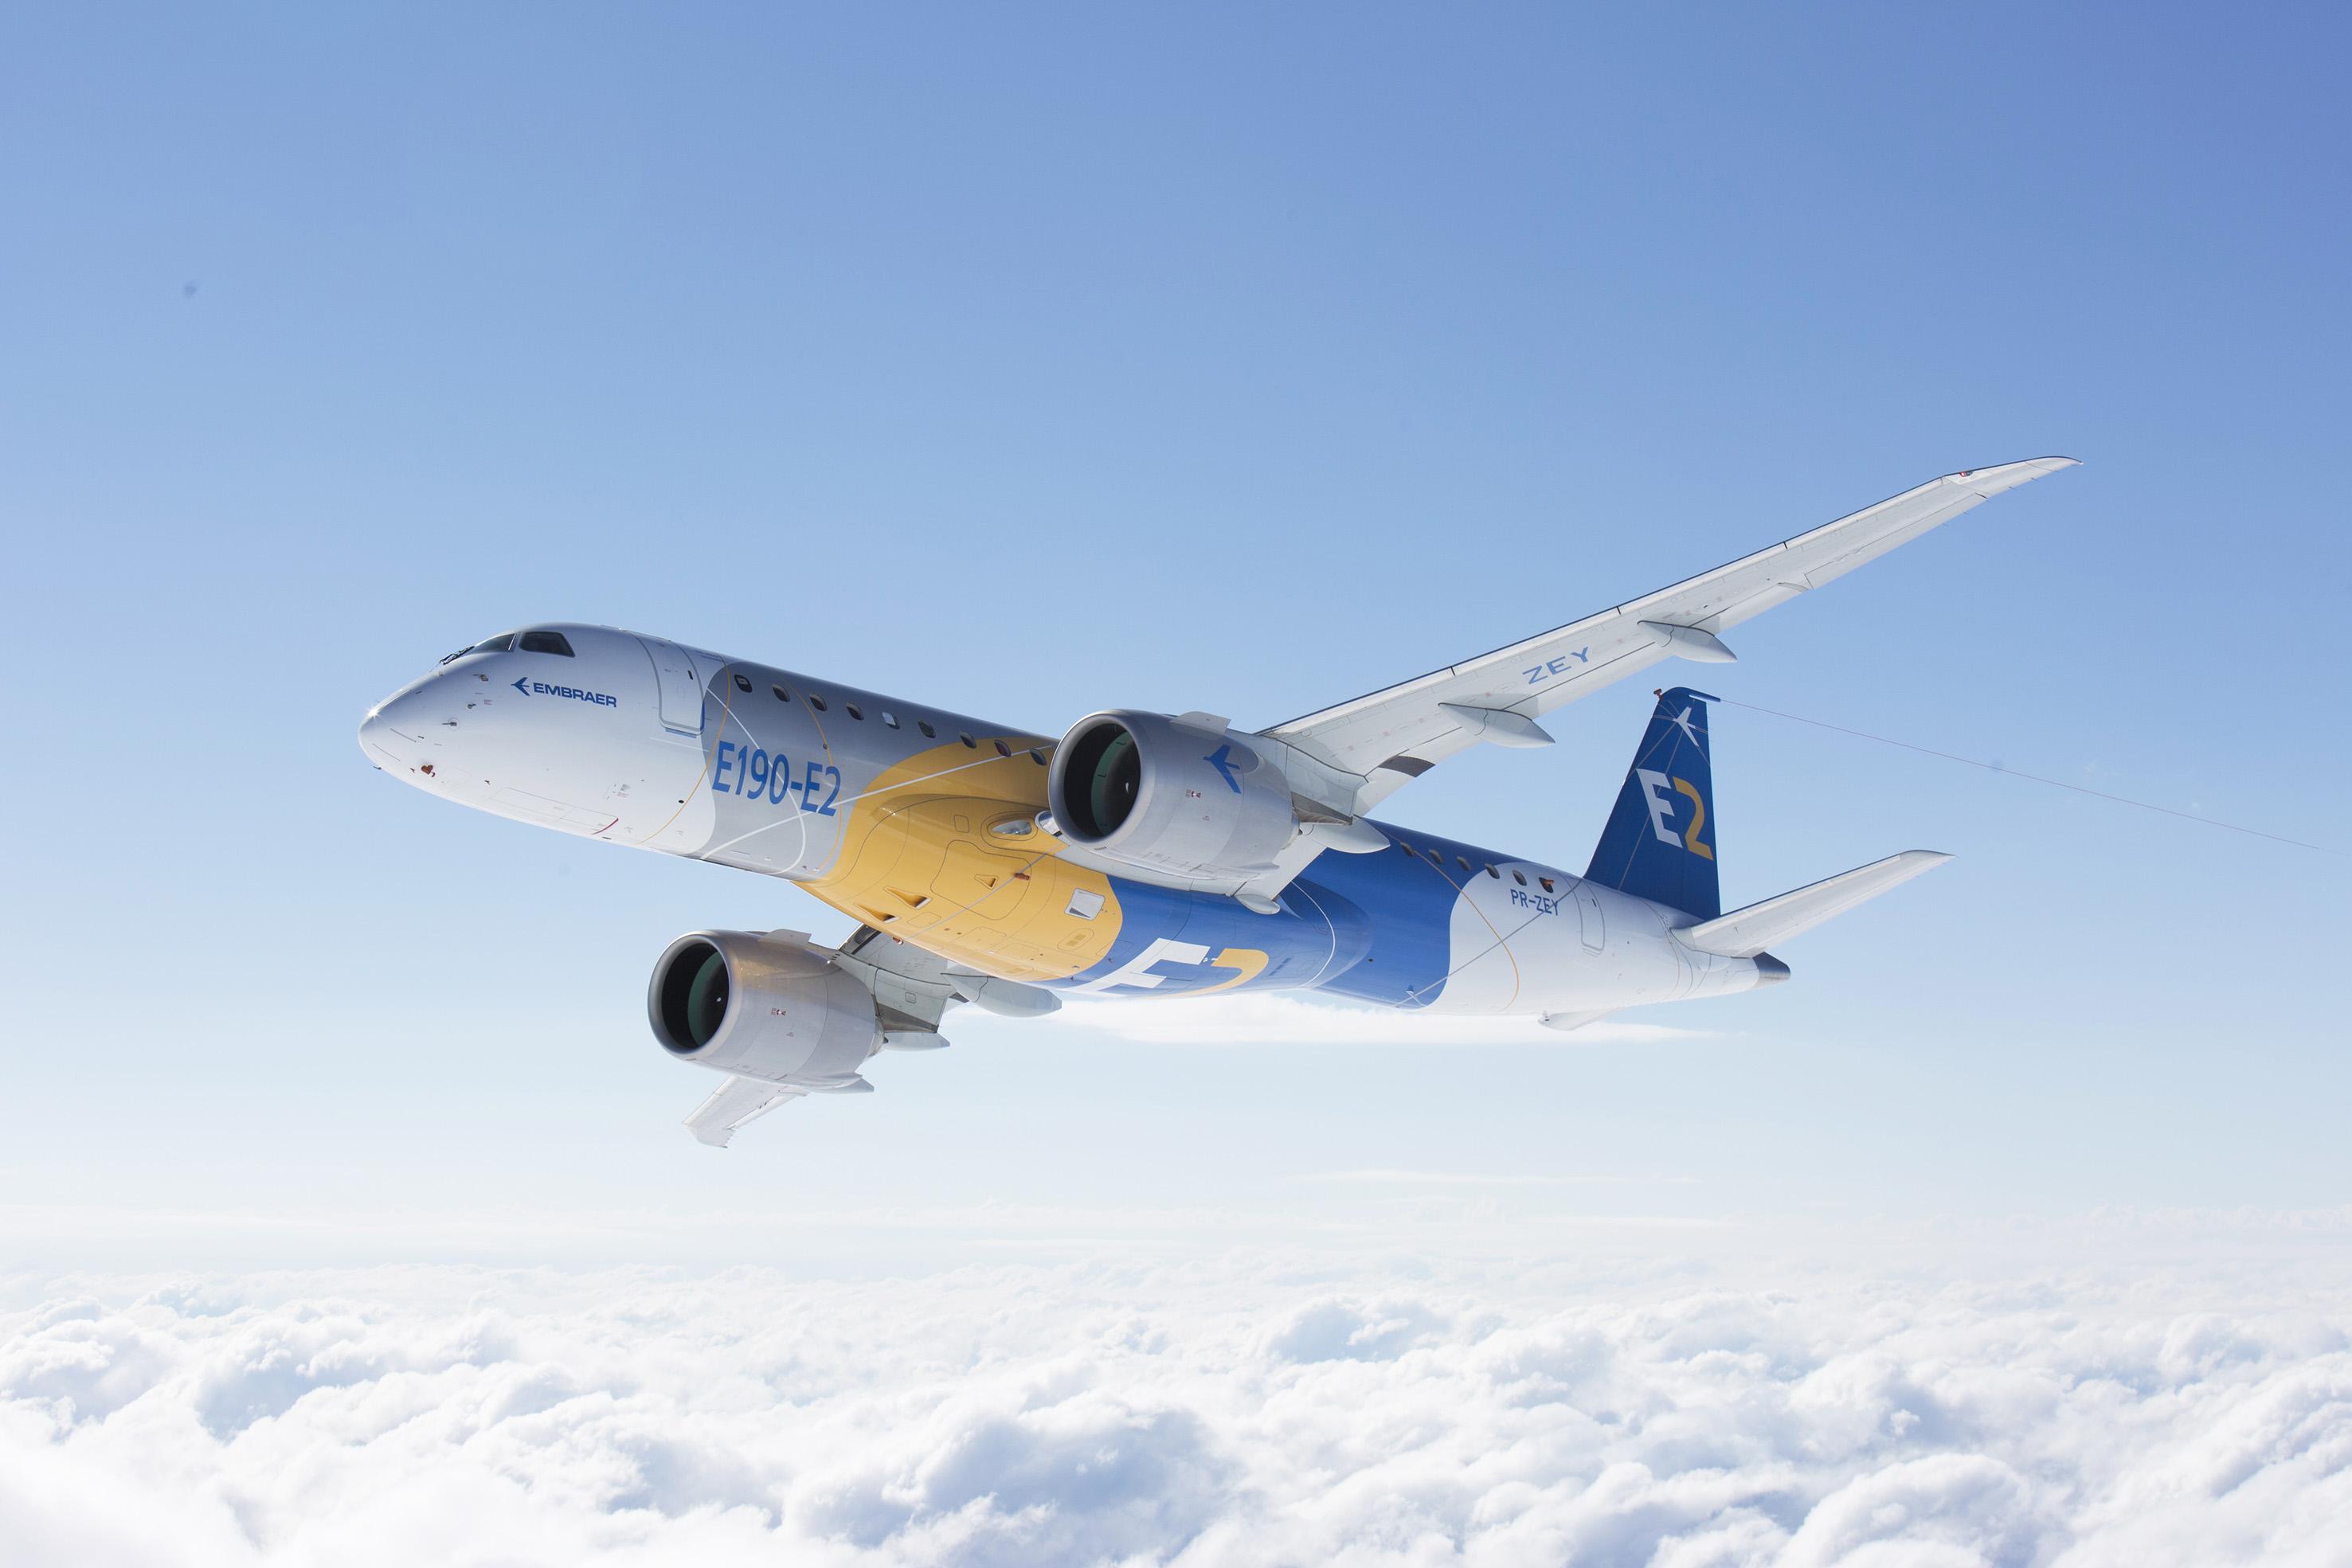 e190-e2_first-flight